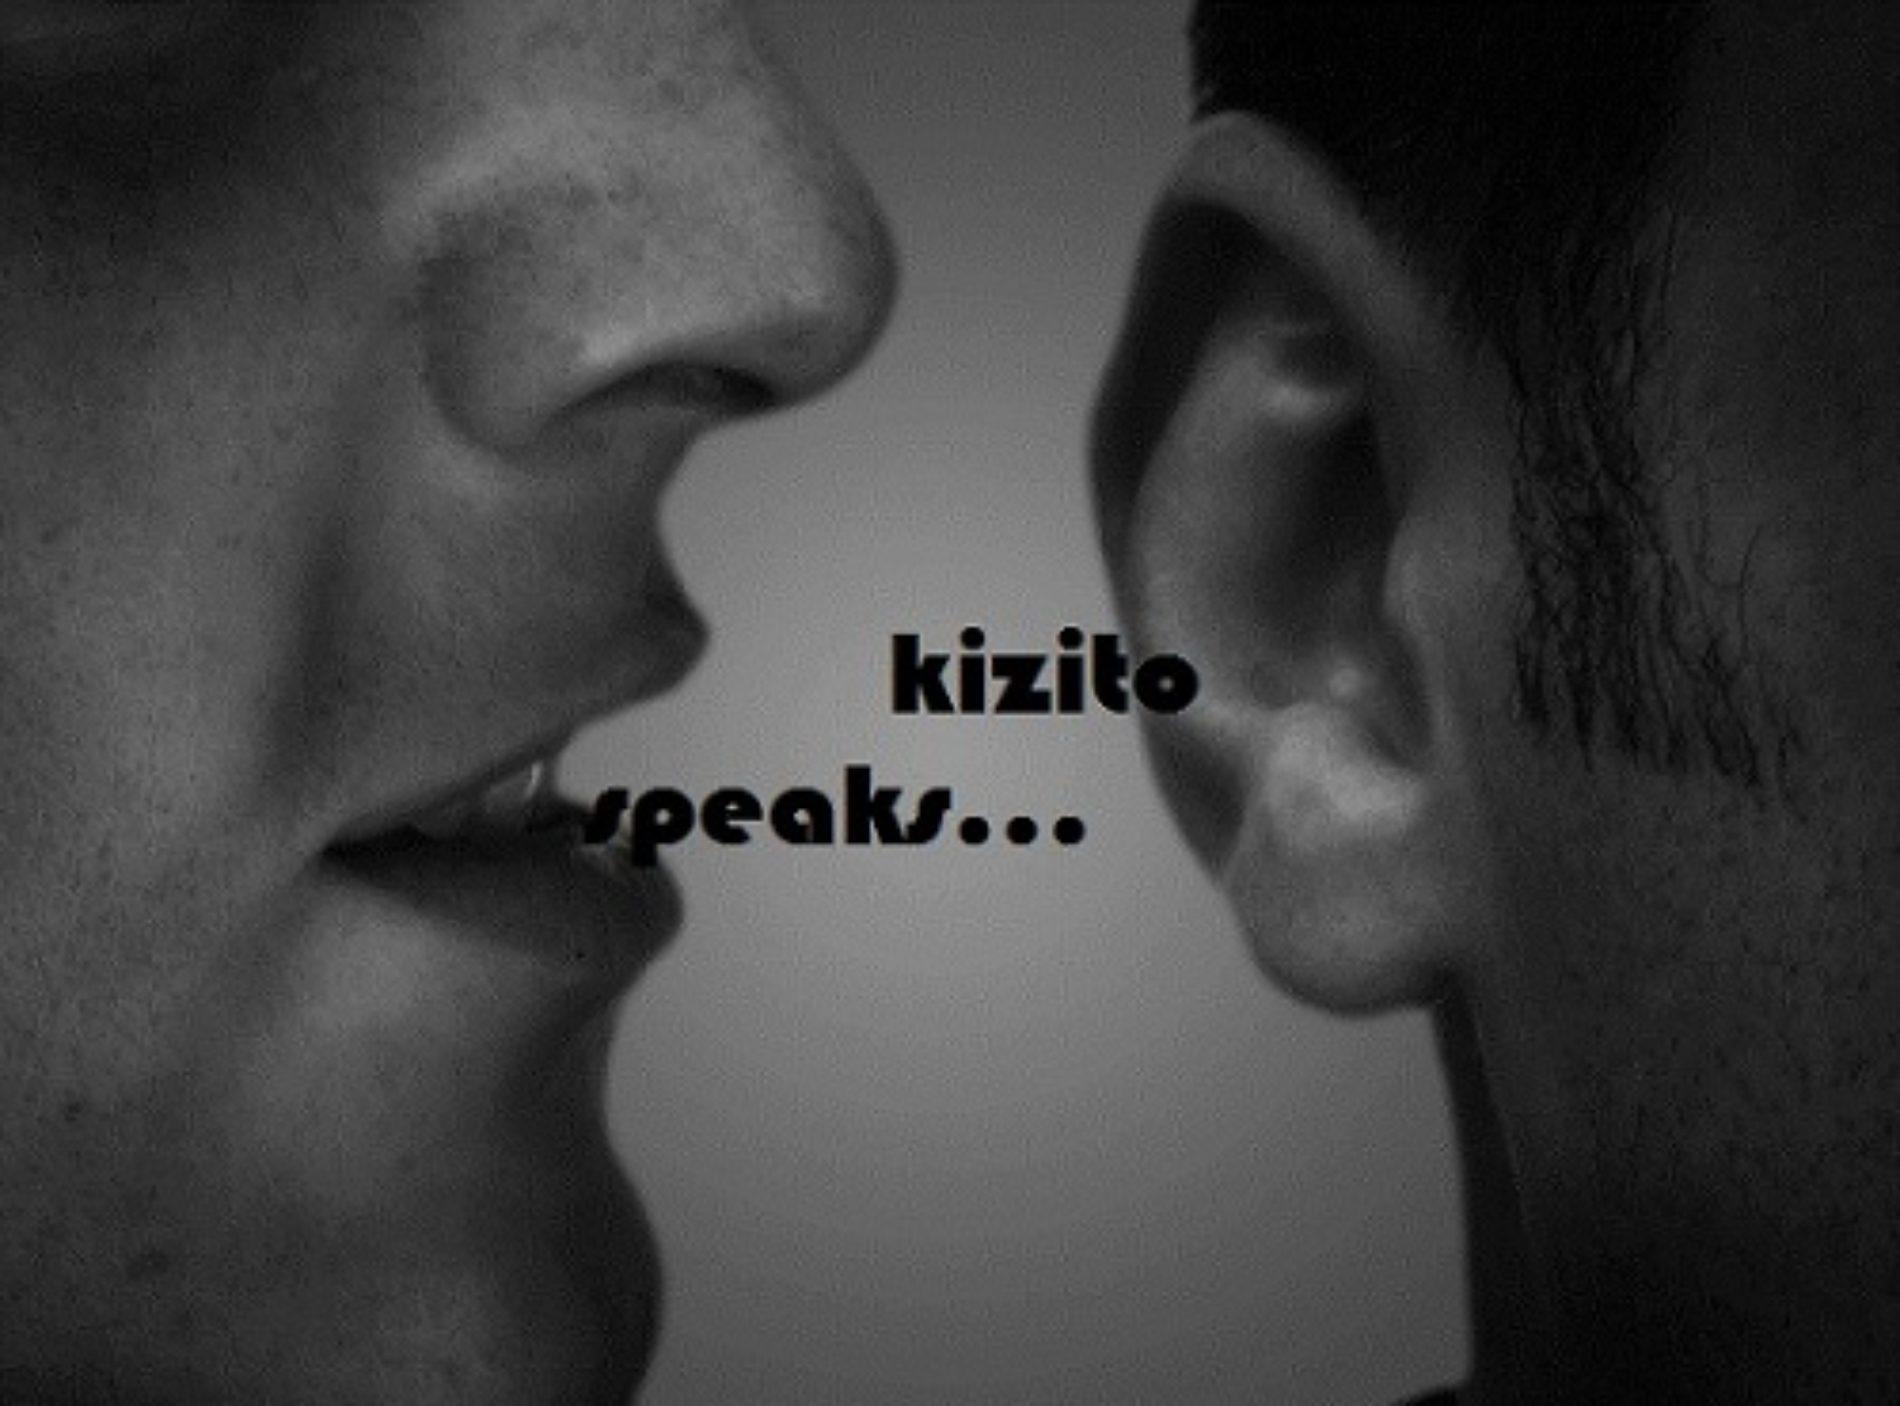 KIZITO SPEAKS XVIII